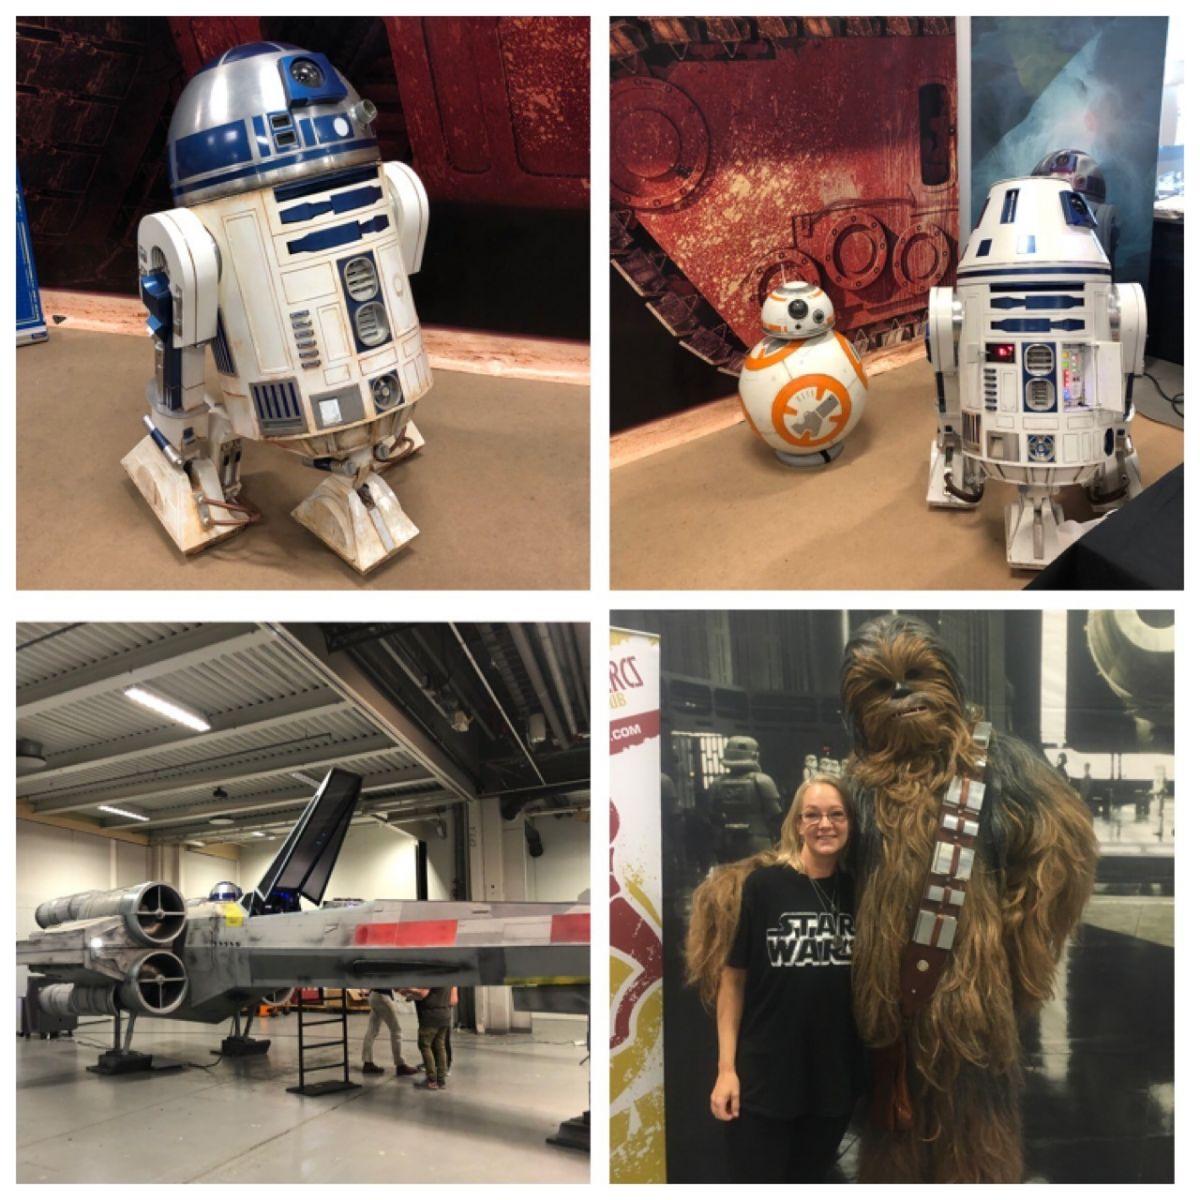 Kollage sci-fi-mässa. Robot R2D2, BB8, Sophia och Chewie